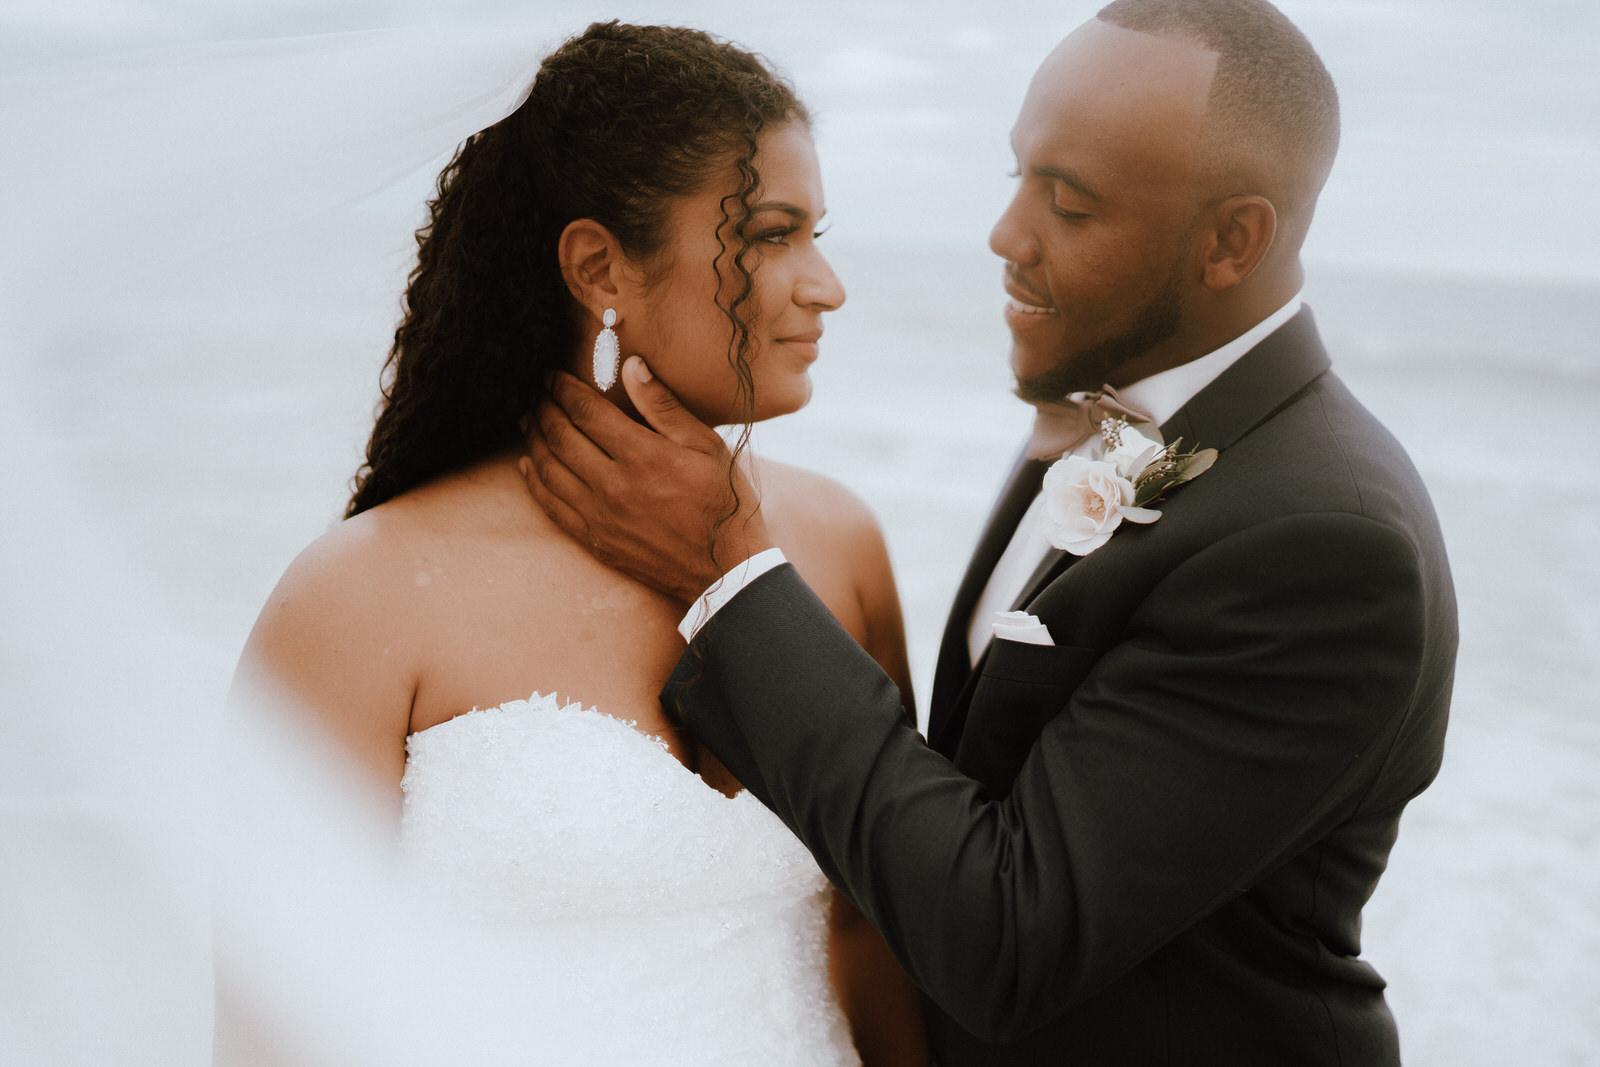 South Seas Island Resort Elopement- Alyana and Shawn- Michelle Gonzalez Photography-237.JPG